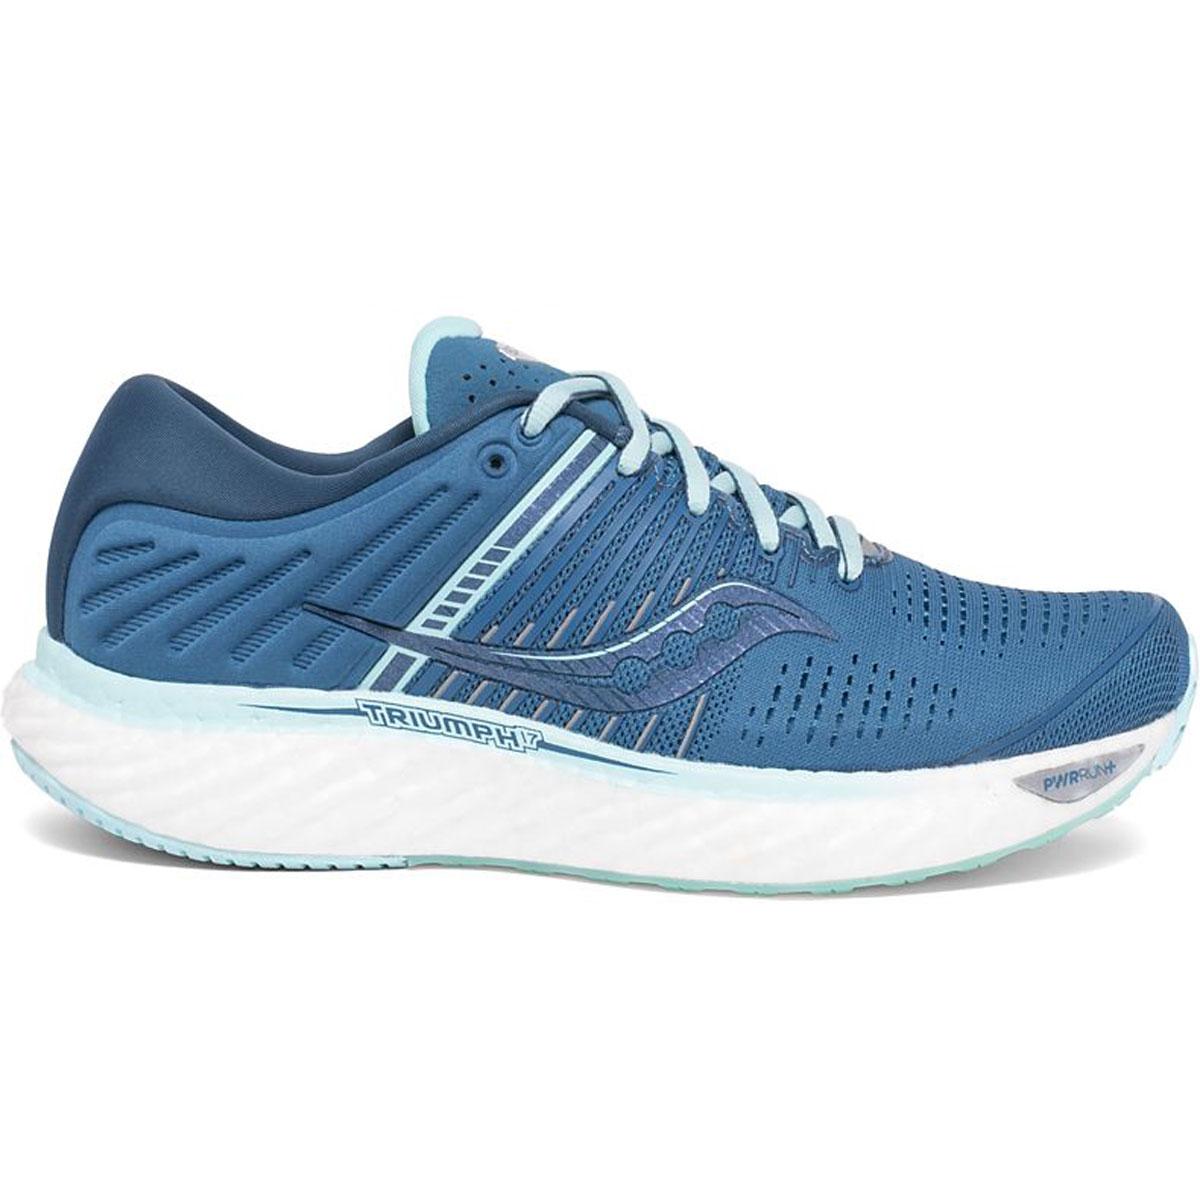 Women's Saucony Triumph 17 Running Shoe - Color: Blue/Aqua - Size: 5 - Width: Regular, Blue/Aqua, large, image 1